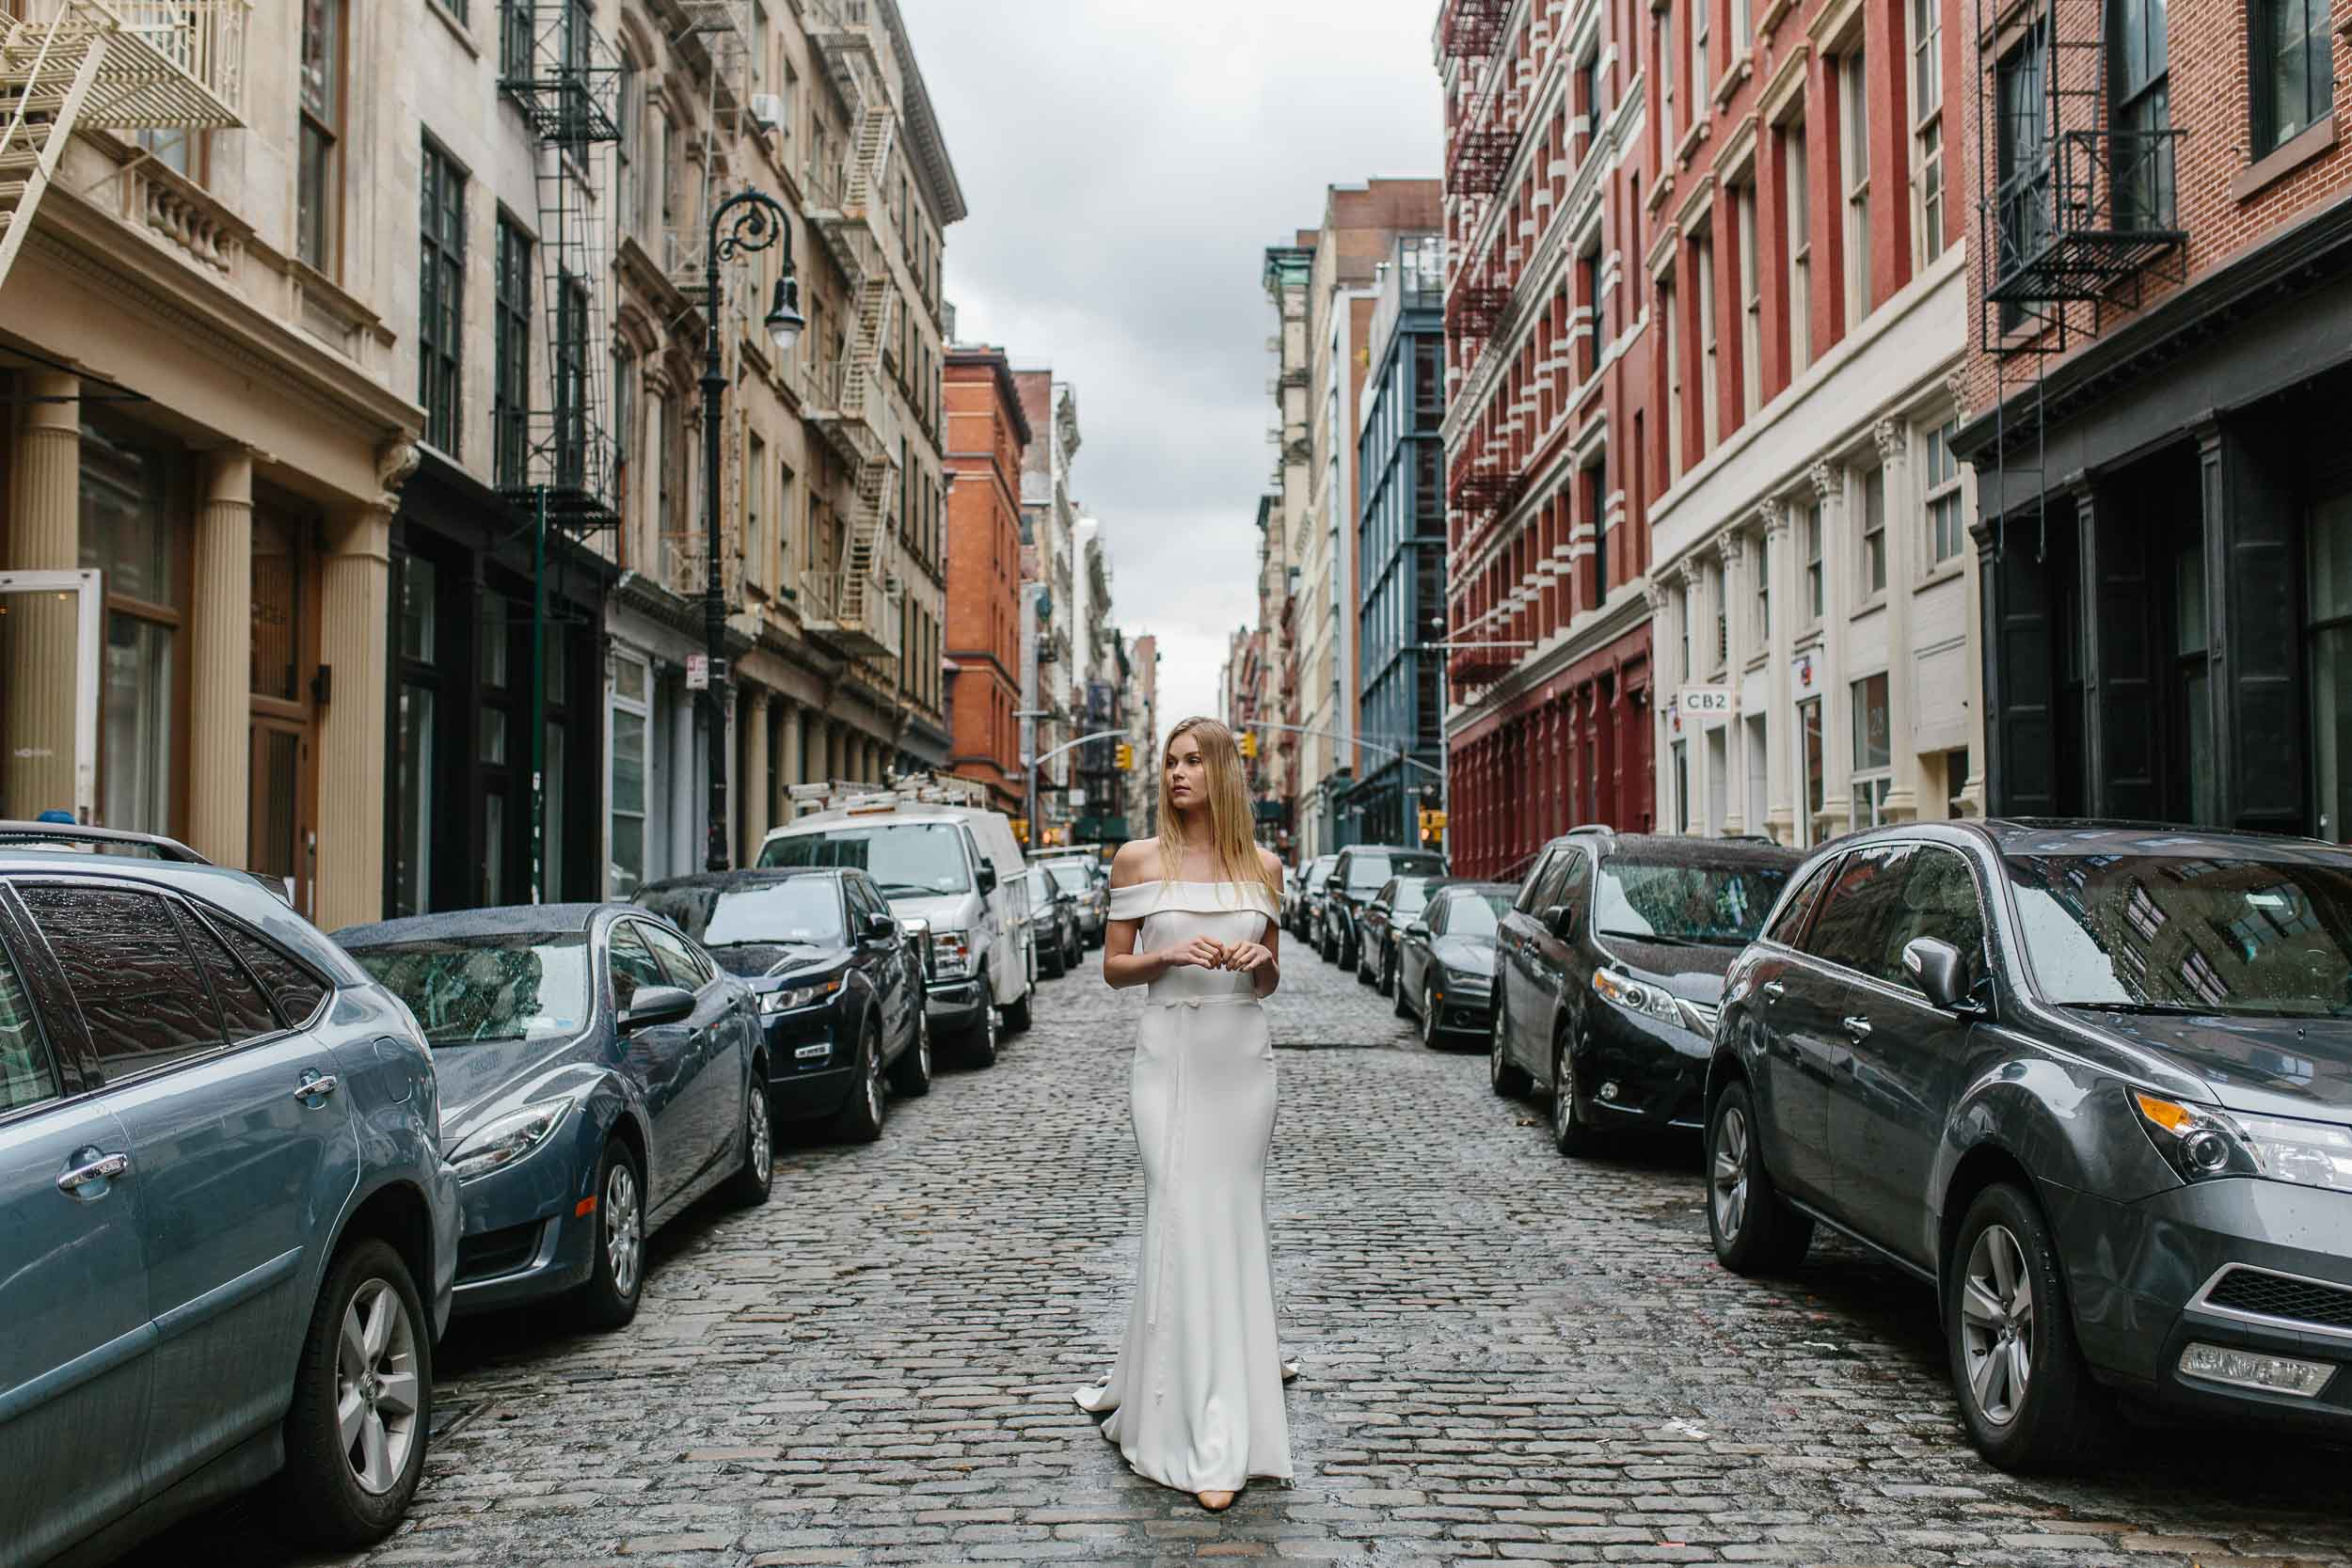 Kas-Richards-New-York-City-Wedding-Karen-Willis_Holmes-56.jpg